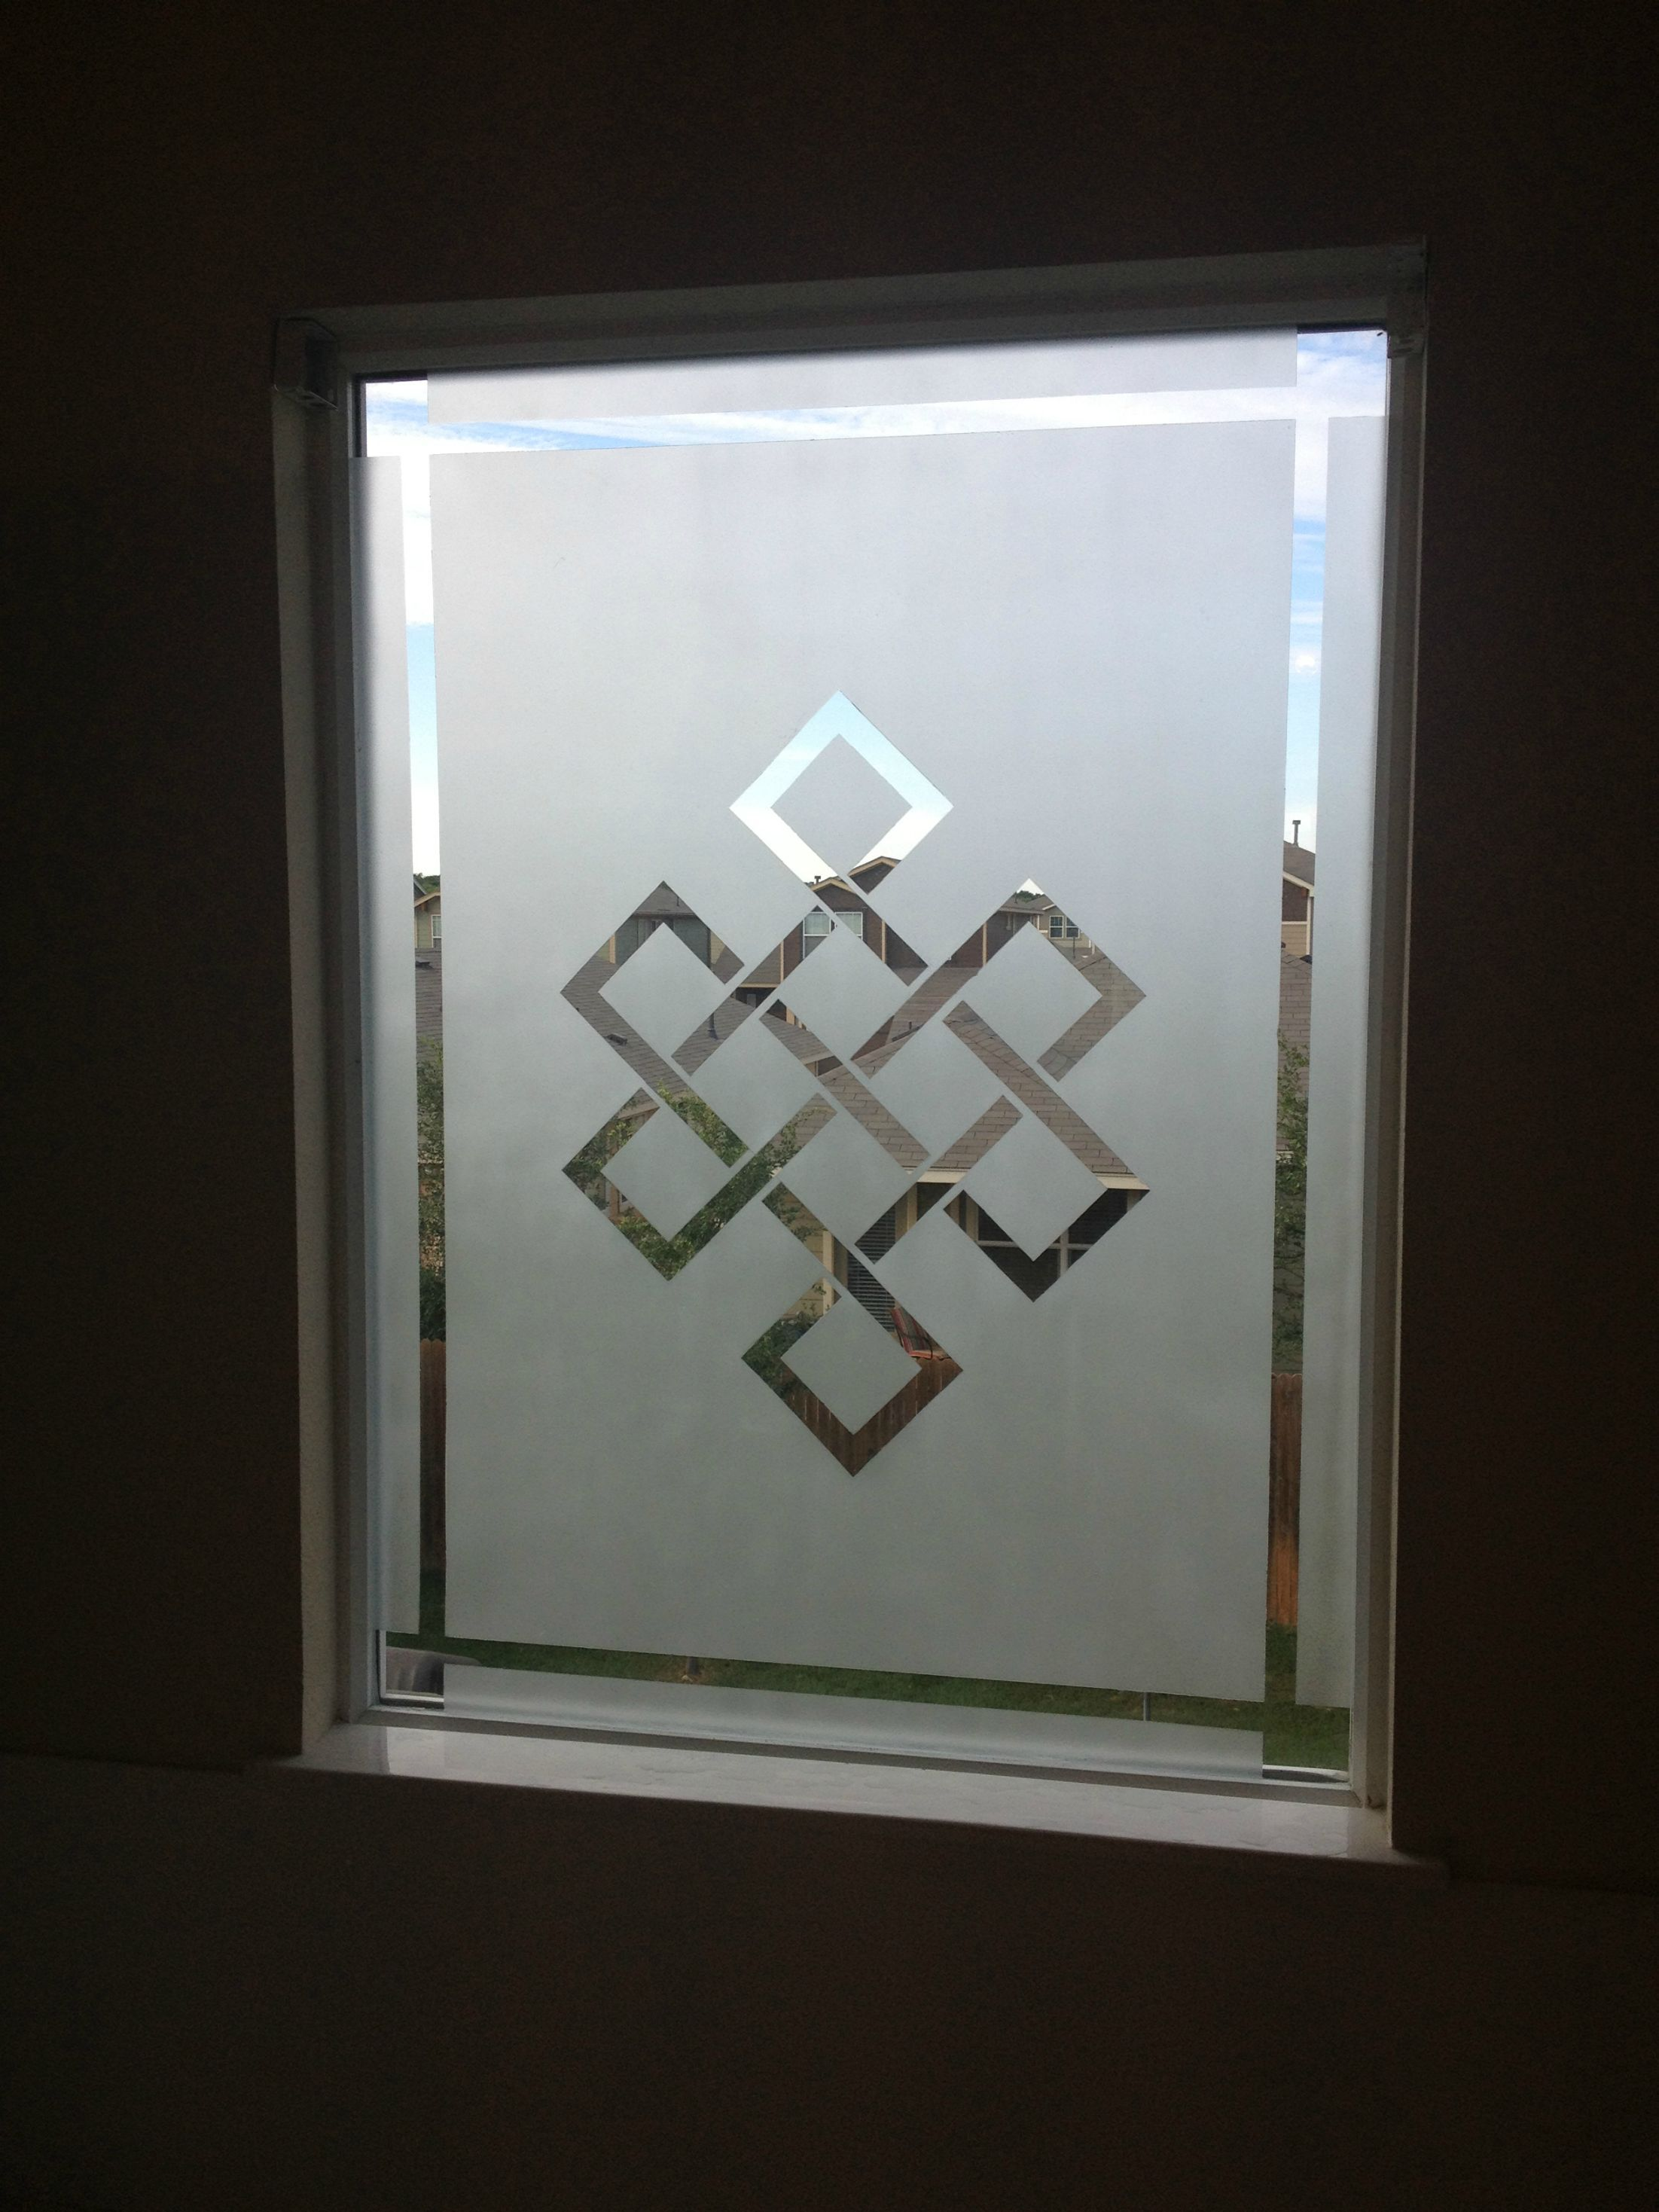 Tibetan Knot design frosted bathroom window. from reddit